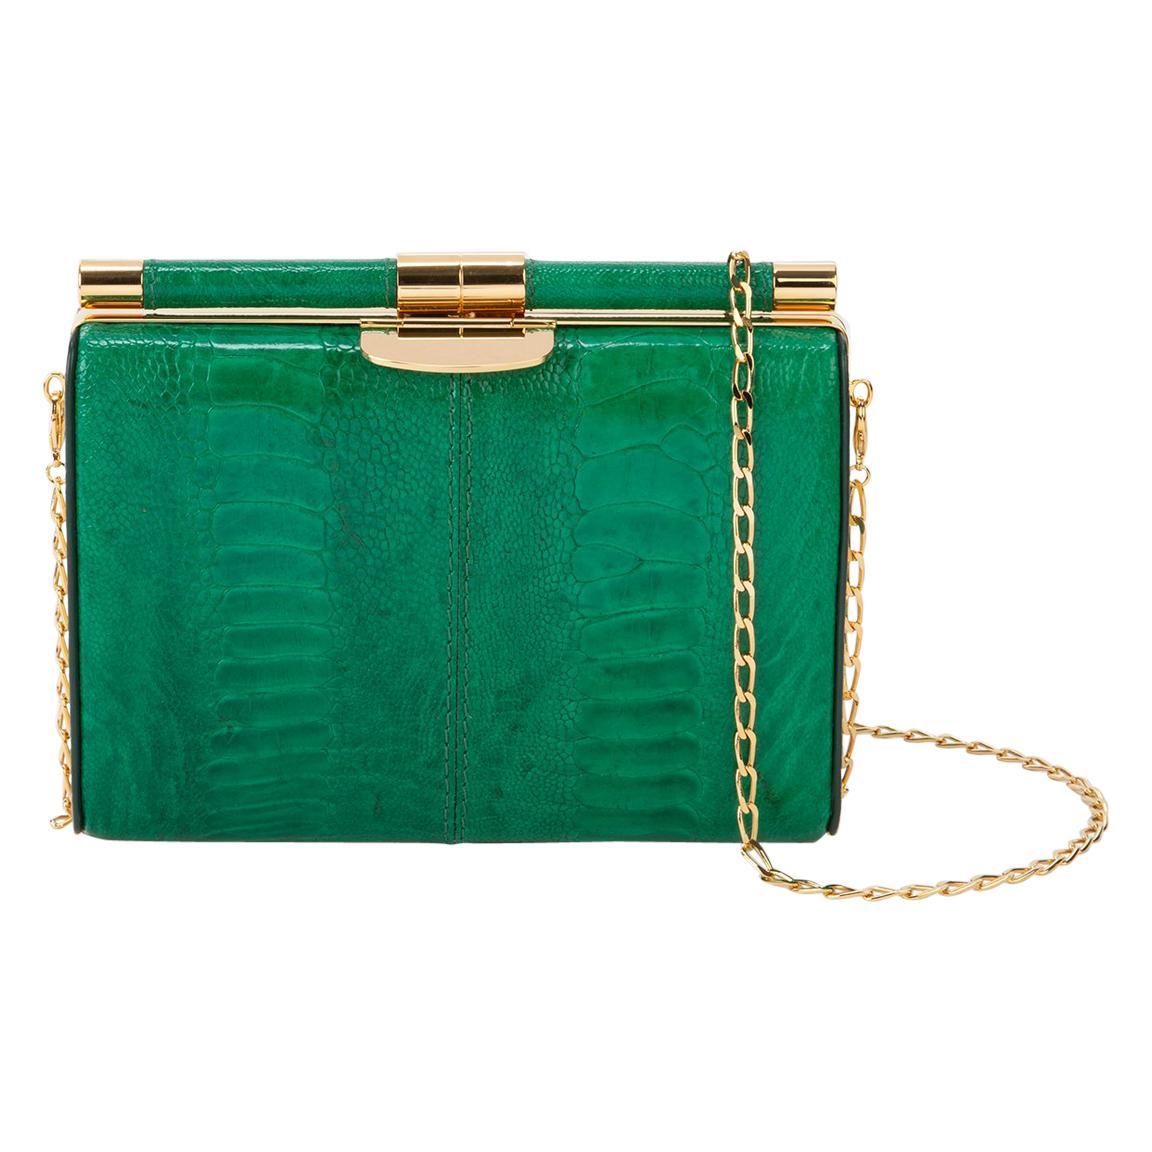 47015878b8 Vintage Ostrich Handbags - 193 For Sale on 1stdibs